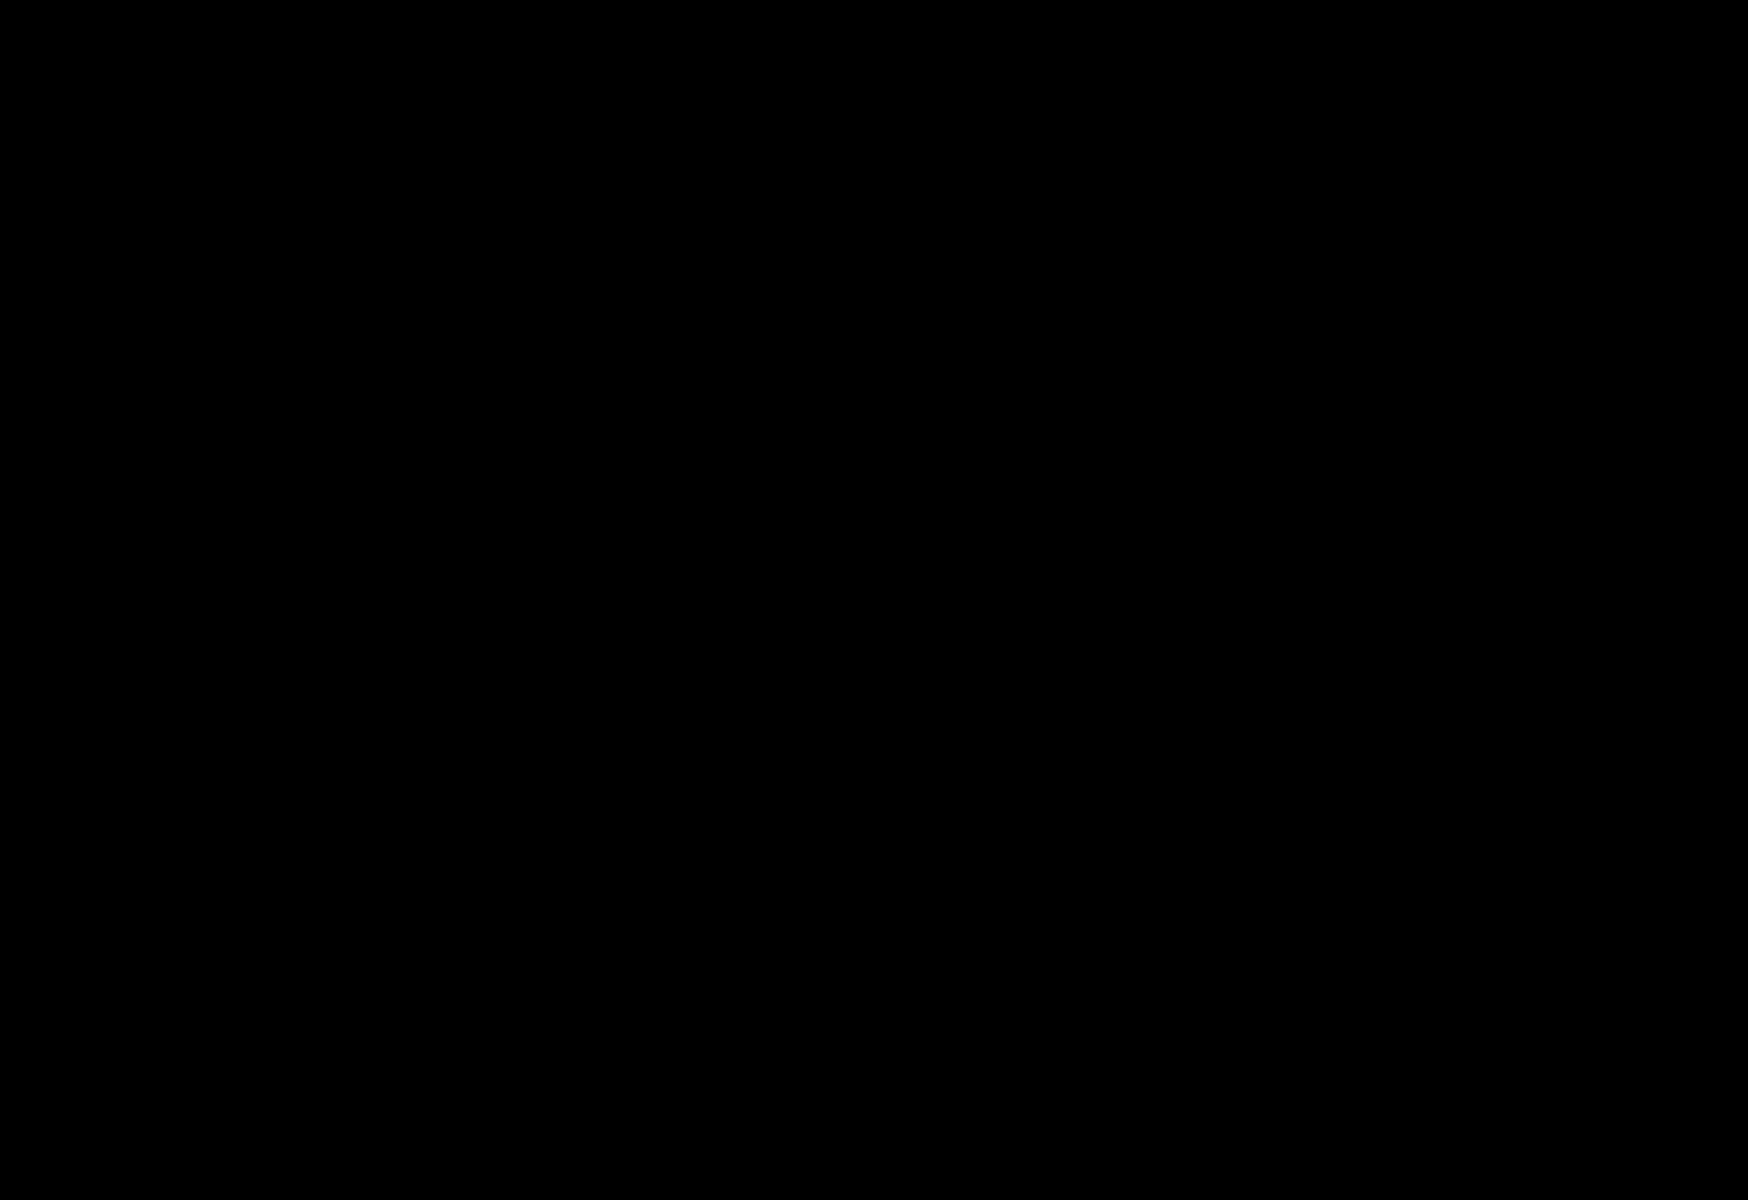 shop Andrei Tarkovsky (Pocket Essential series) 2005